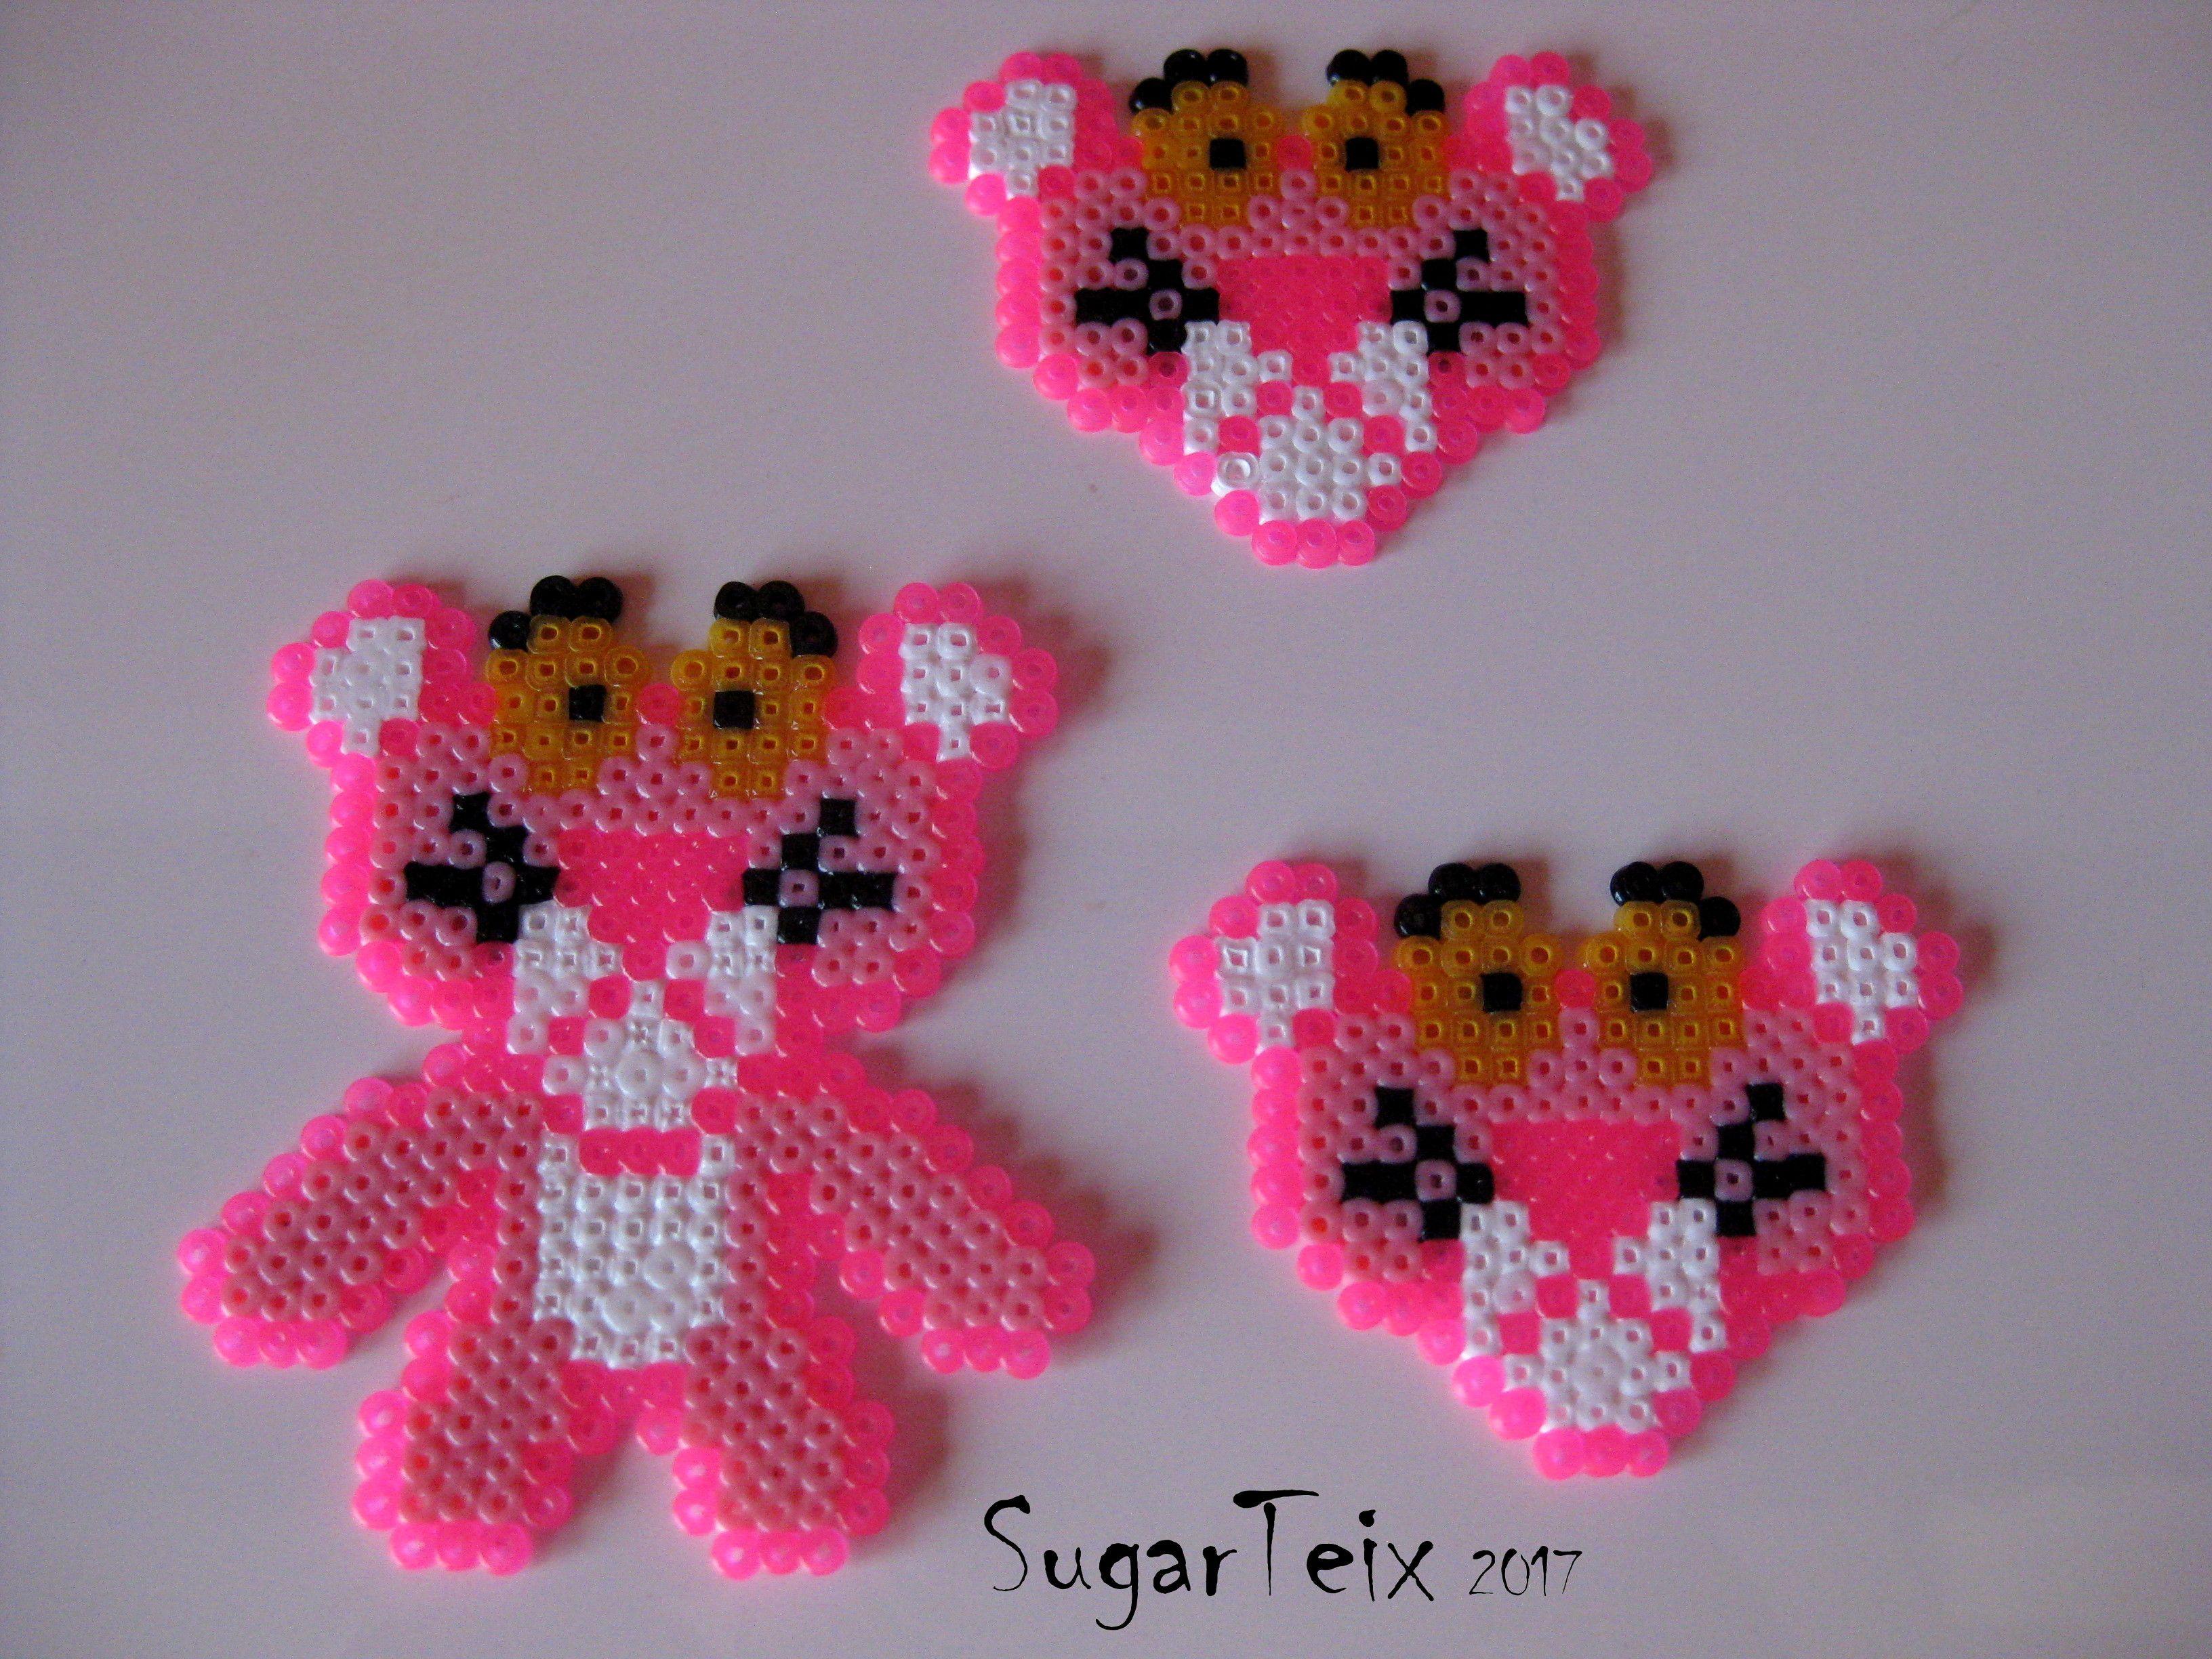 #panterarosa #pinkpanter #hama #hamabeads #pyssla